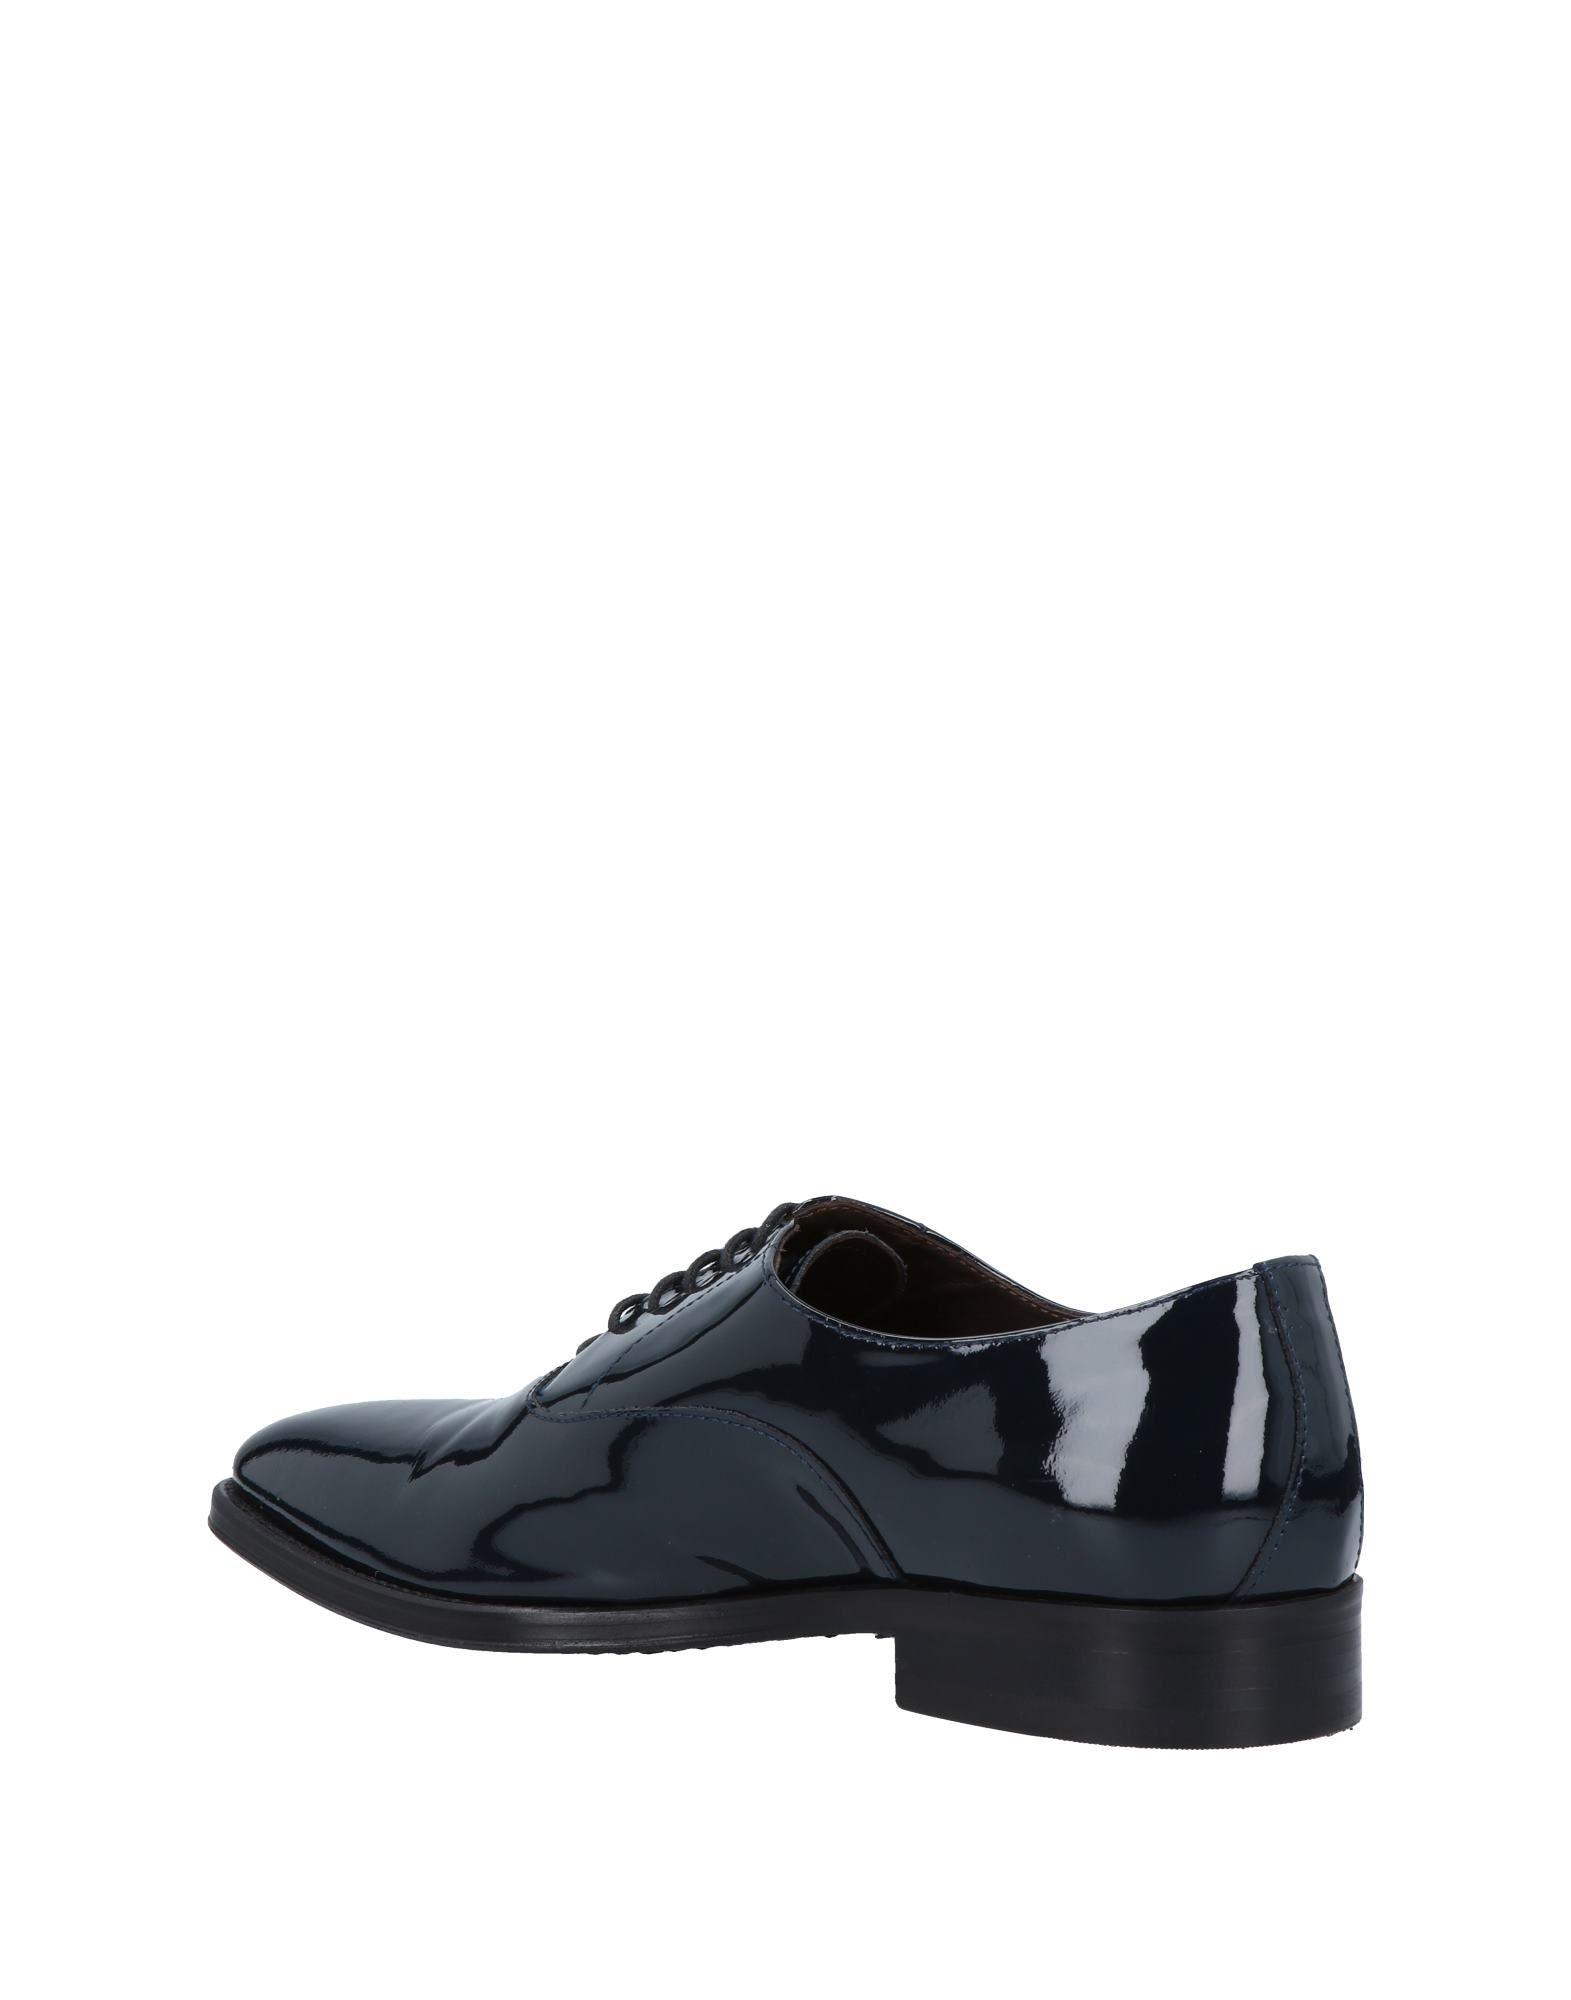 Chaussures - Chaussures À Lacets Brian Dales Y80dz9wCpQ